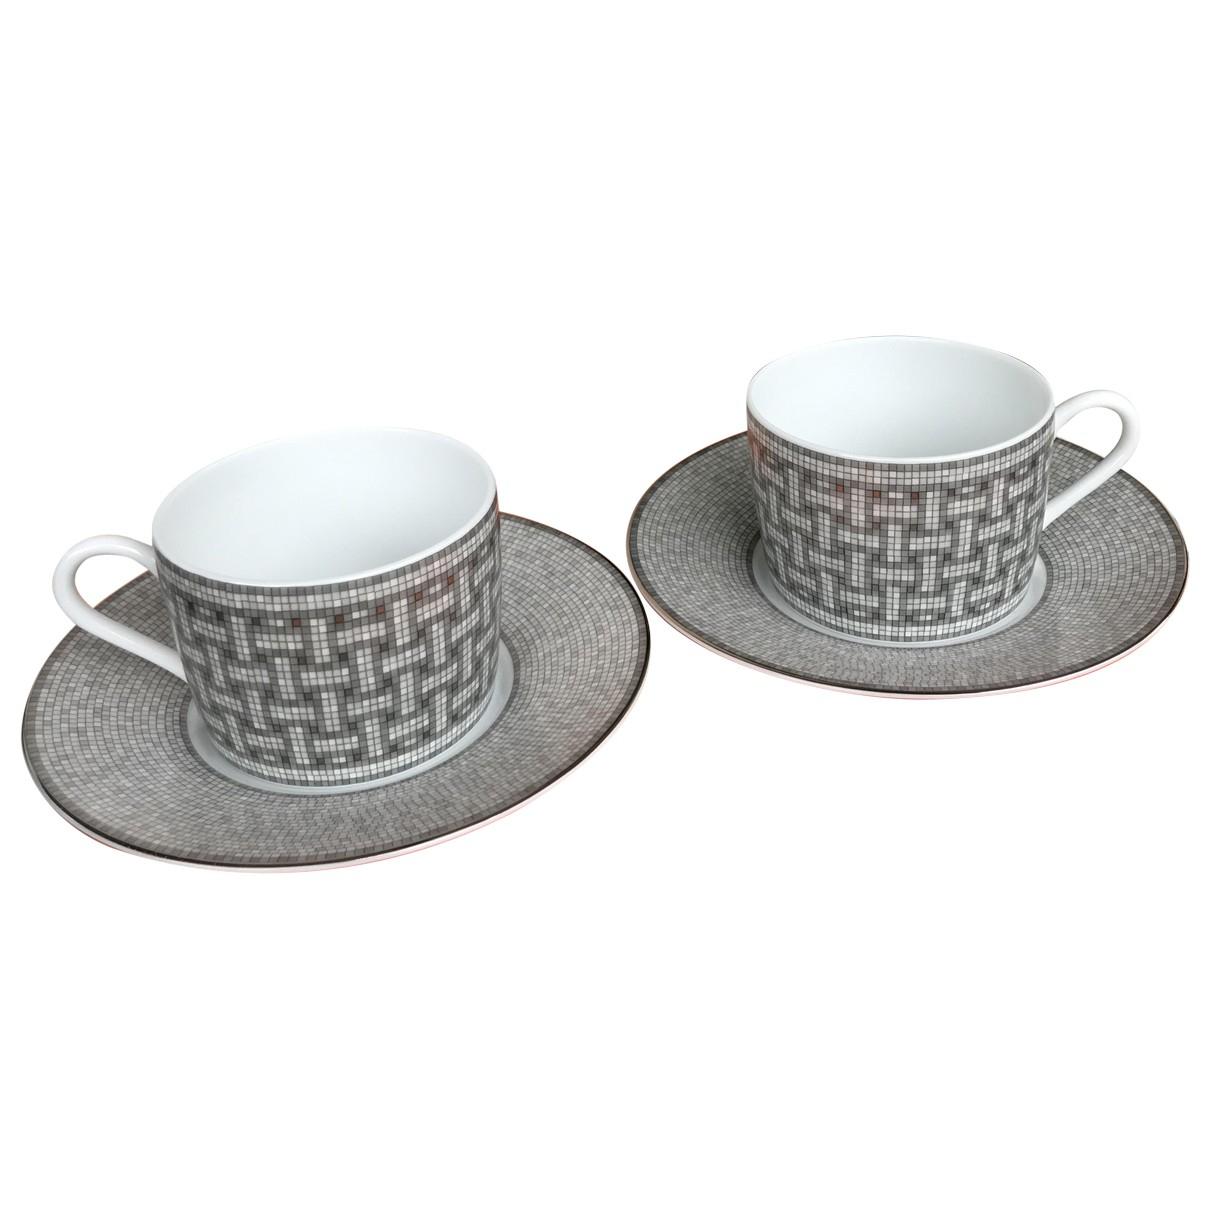 Juego de te/cafe Mosaique au 24 de Porcelana Hermes